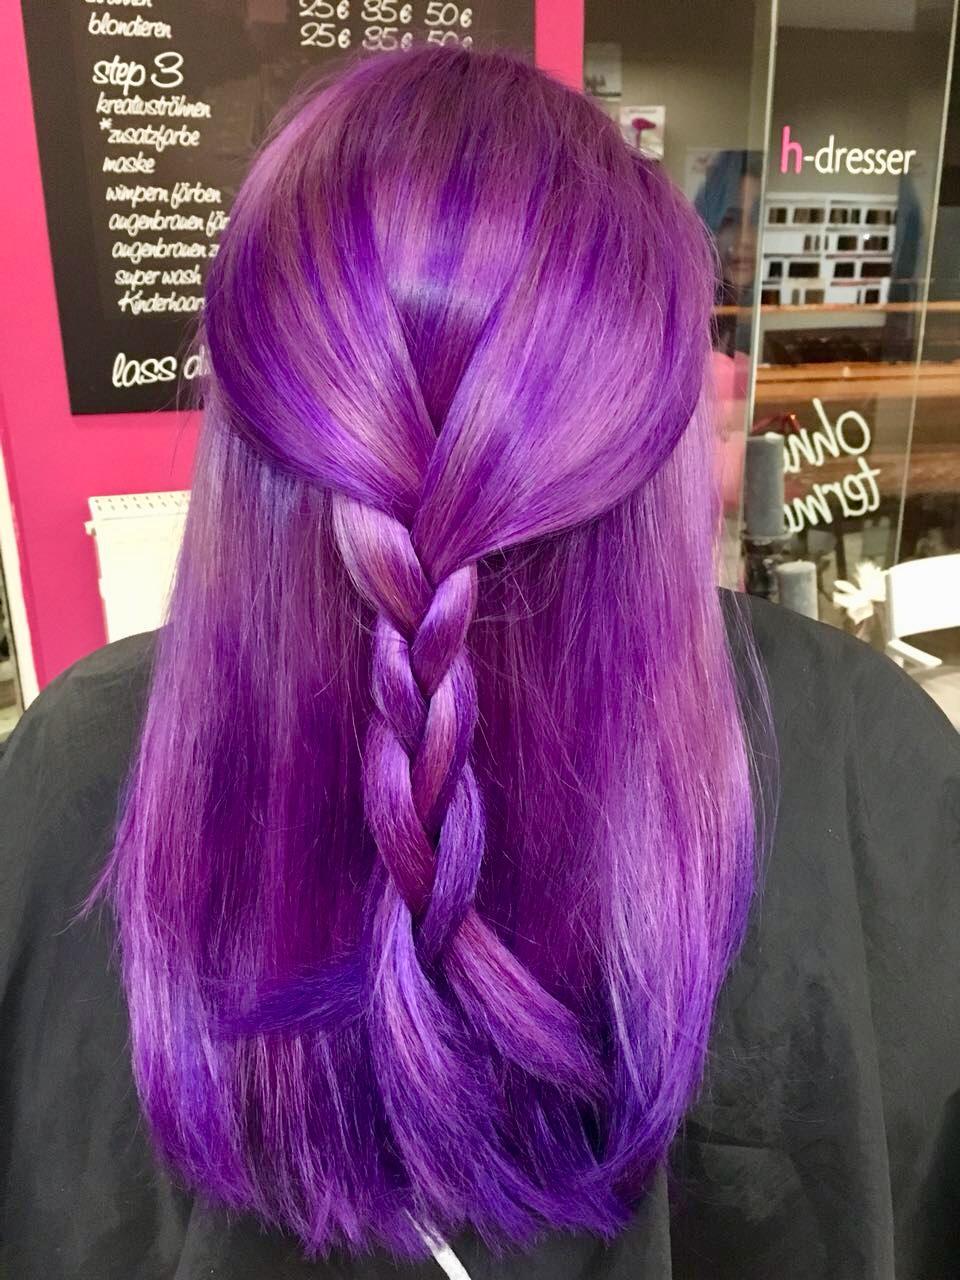 Purple Haarfarbe Bielefeld Friseur